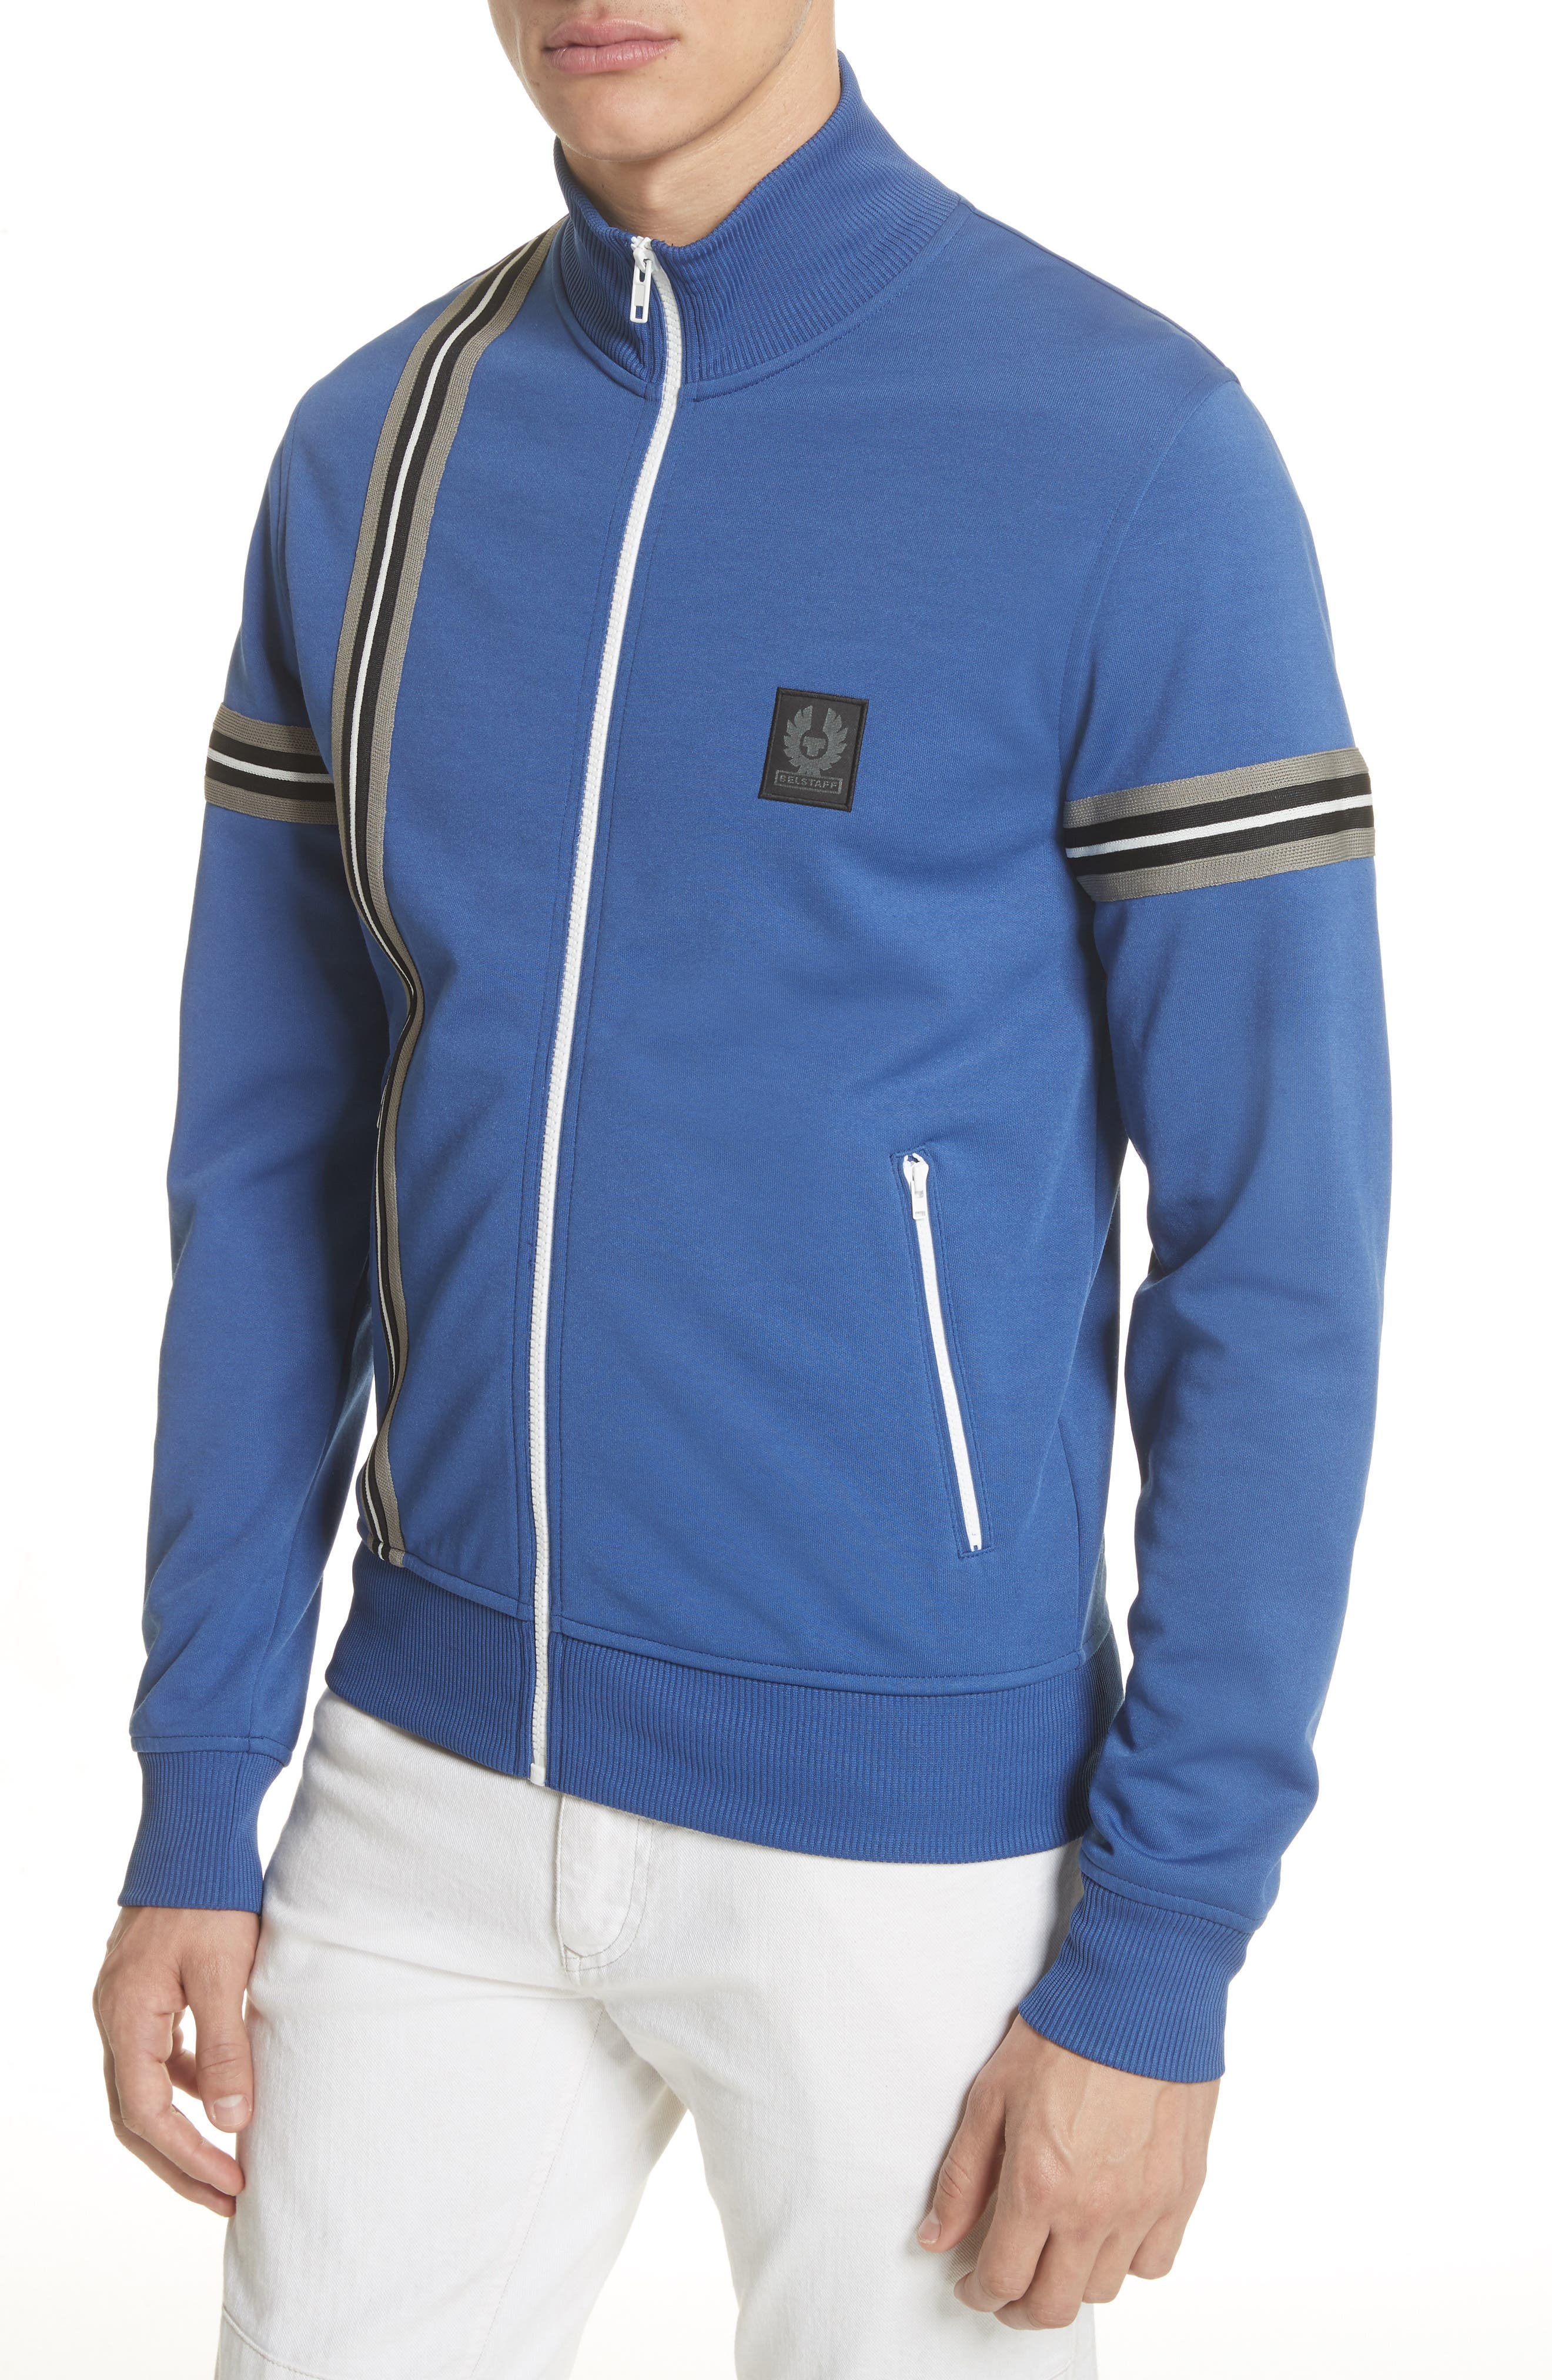 Helmsdale Track Jacket,                             Alternate thumbnail 4, color,                             Deep Electric Blue